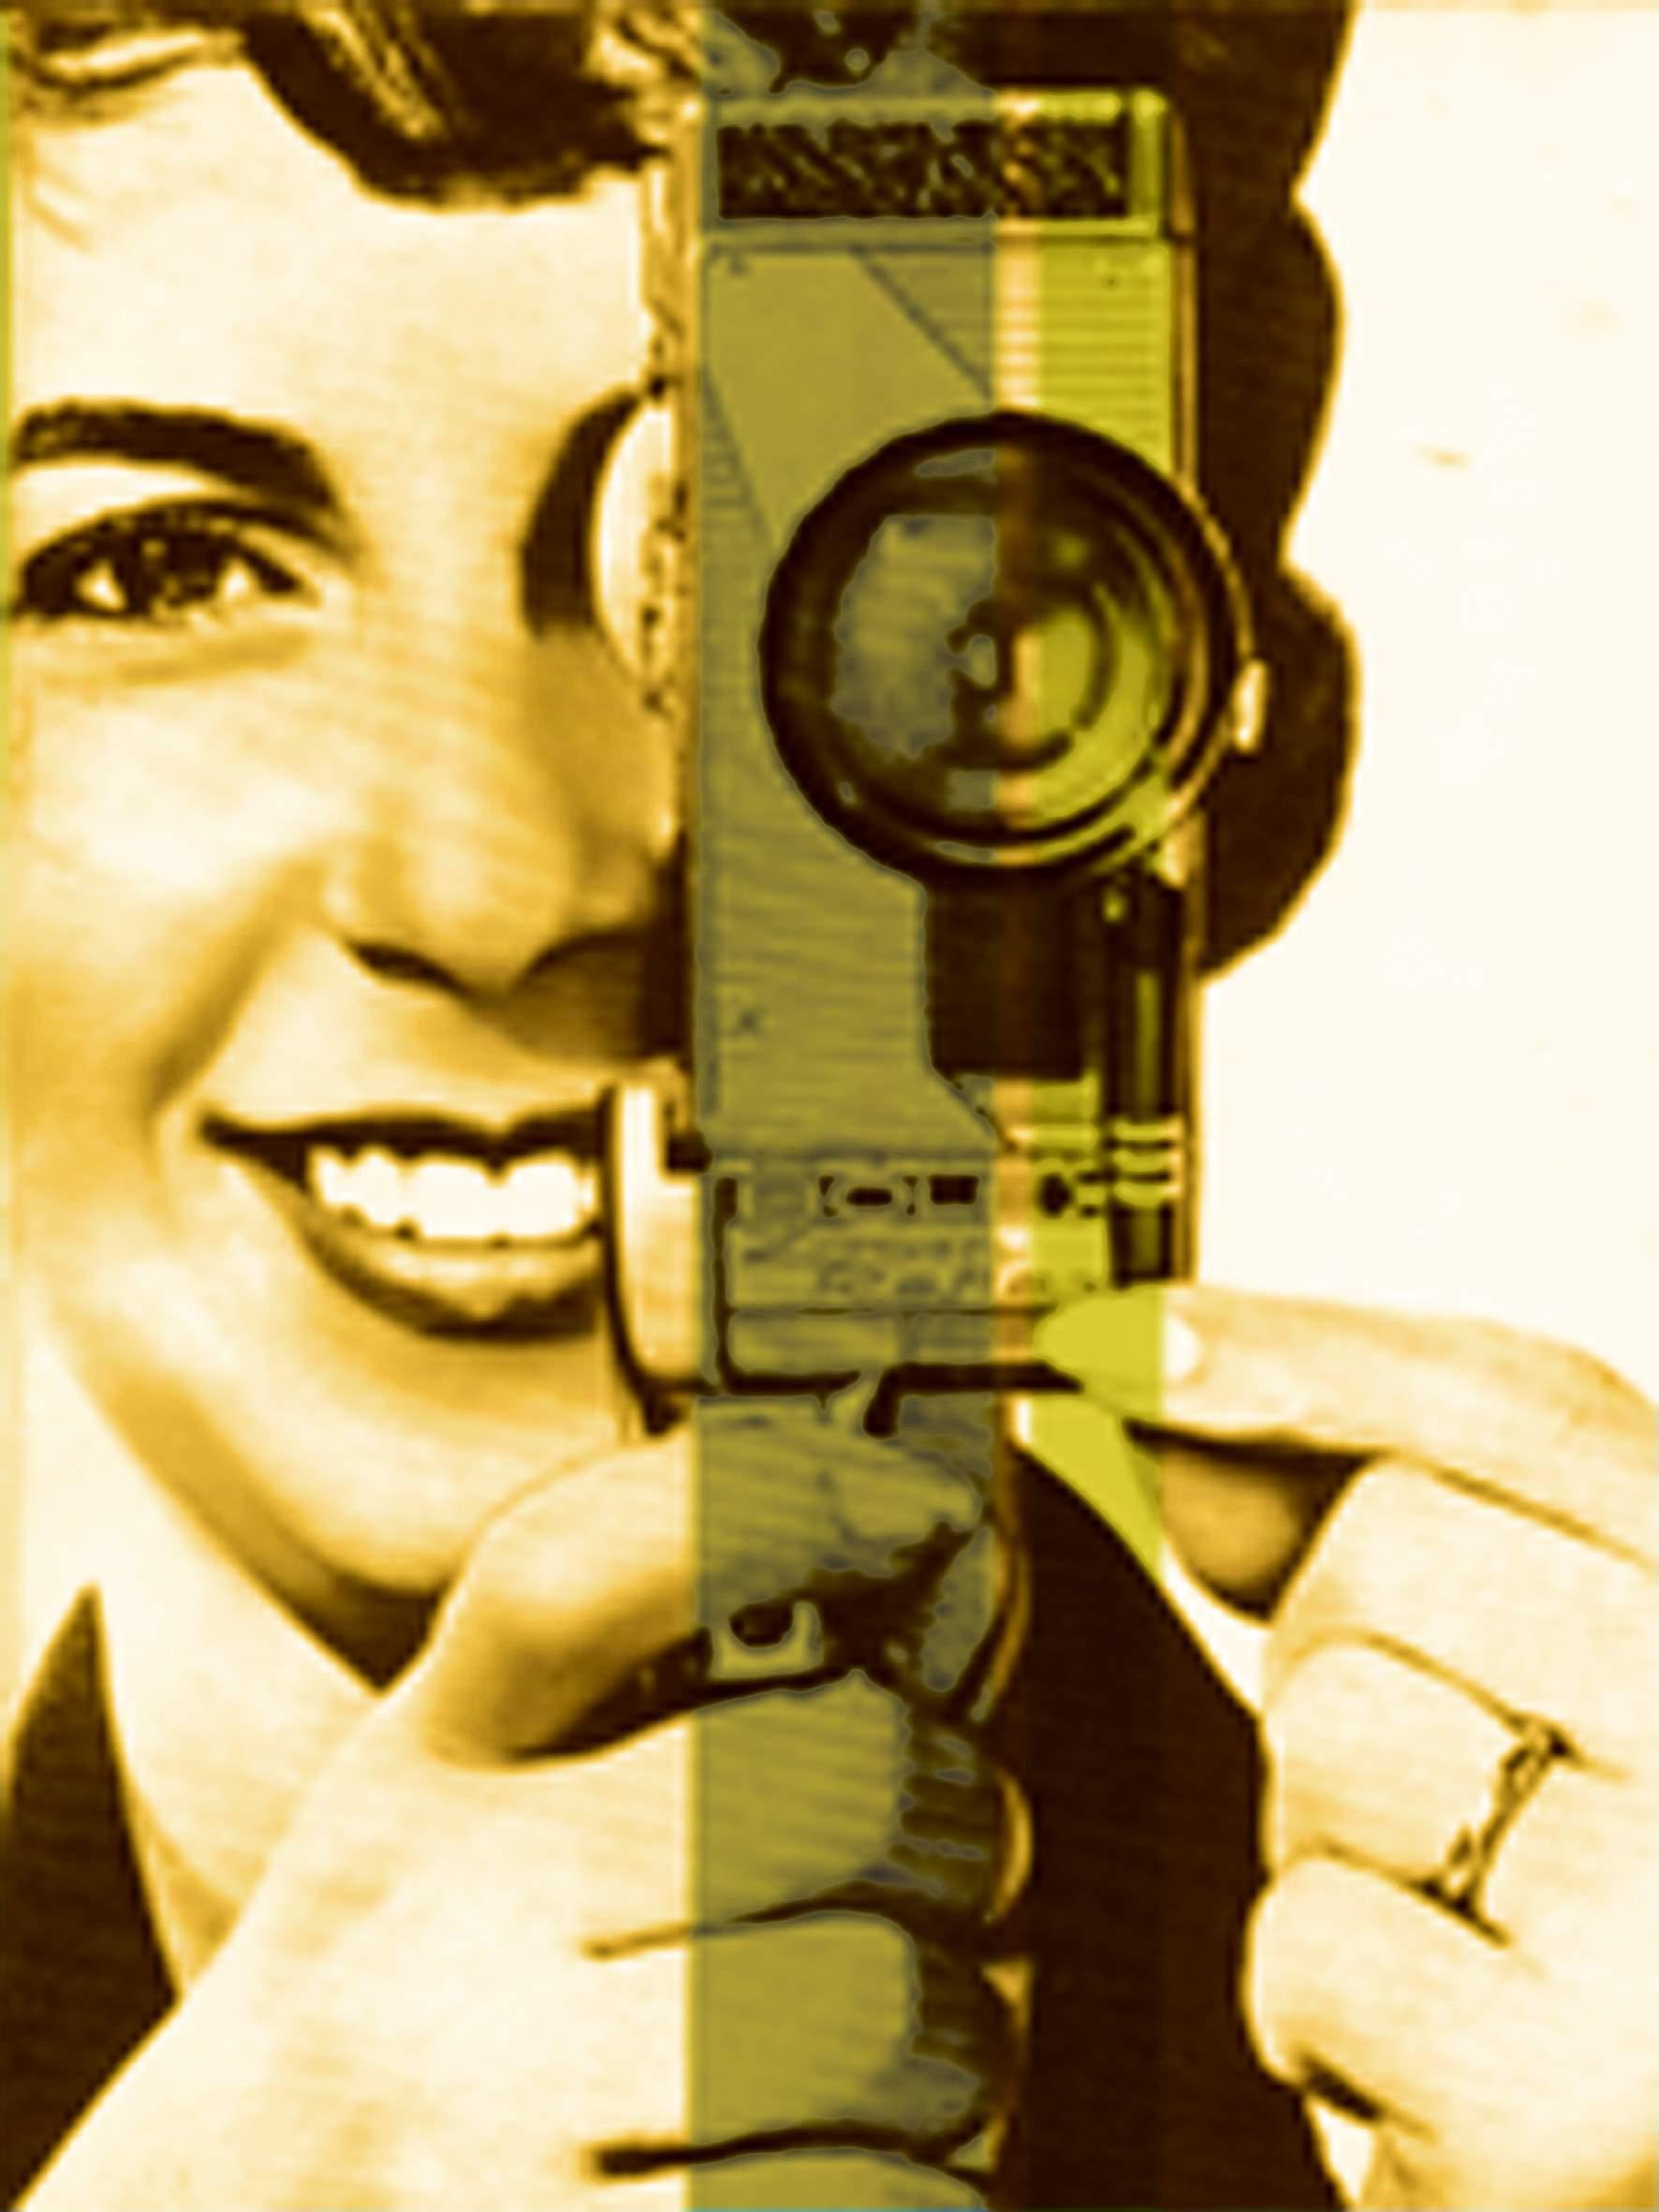 Bespoke Christmas Gift - Vintage Super 8 Cine Film Home Videos aka